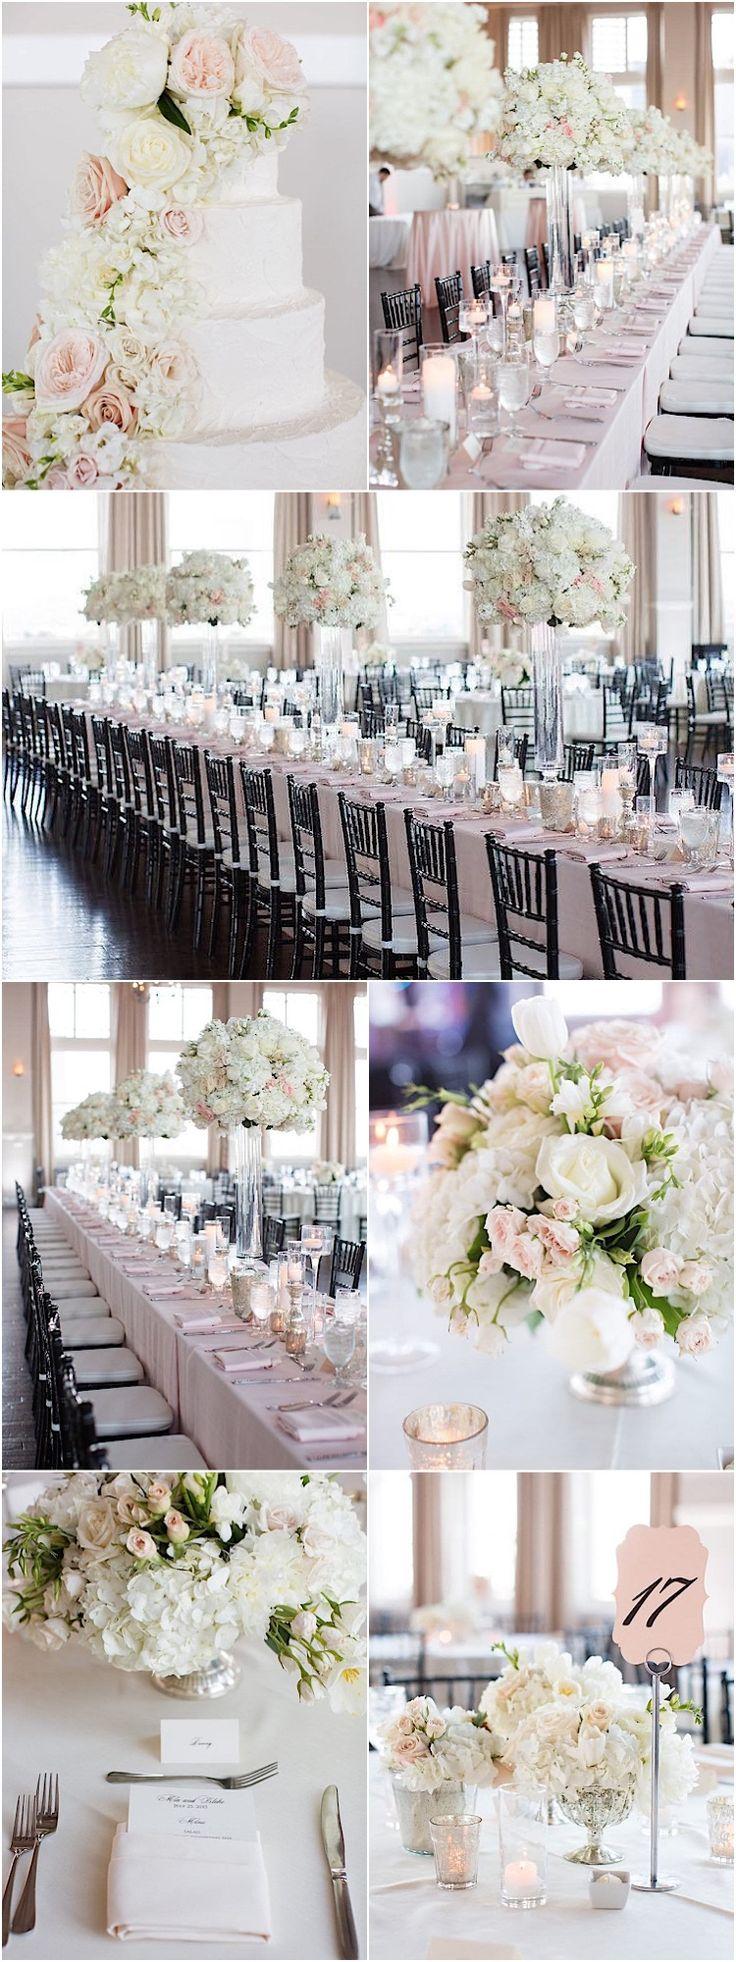 Wedding reception decoration ideas   best SolMates images on Pinterest  Wedding ideas Reception